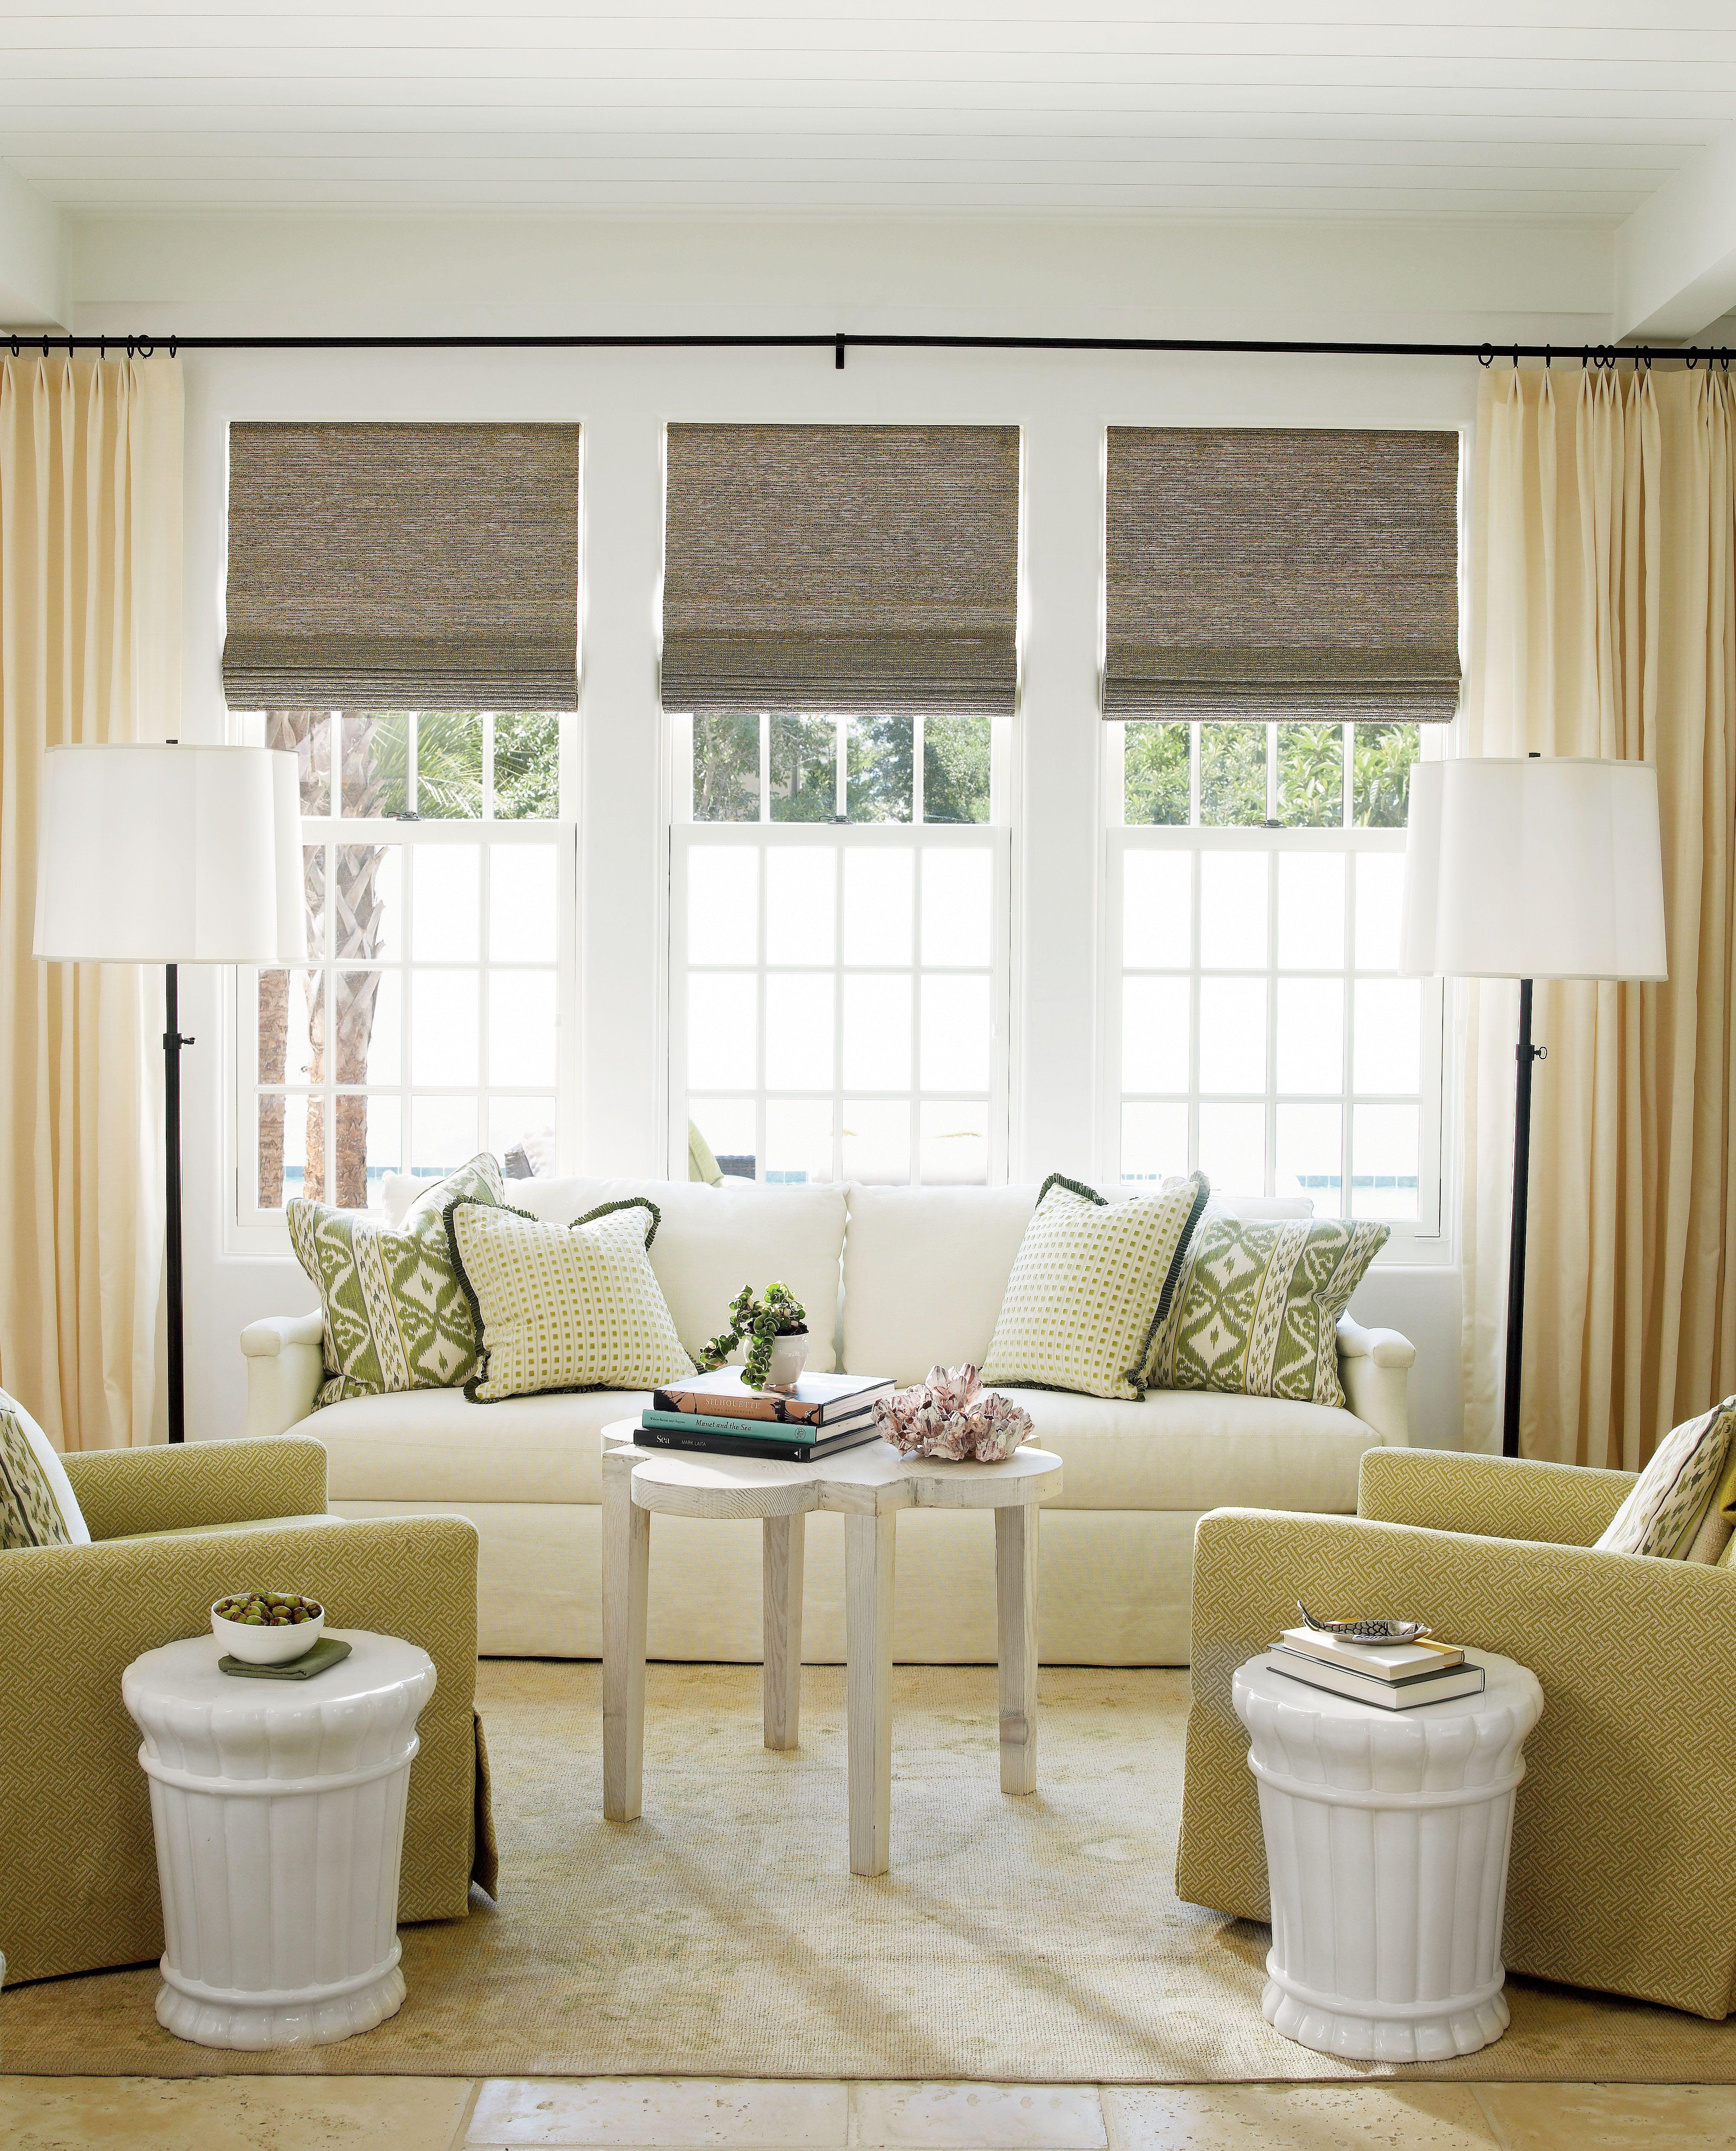 2012   Rosemary Beach   Living Room   Designer: Urban Grace Interiors